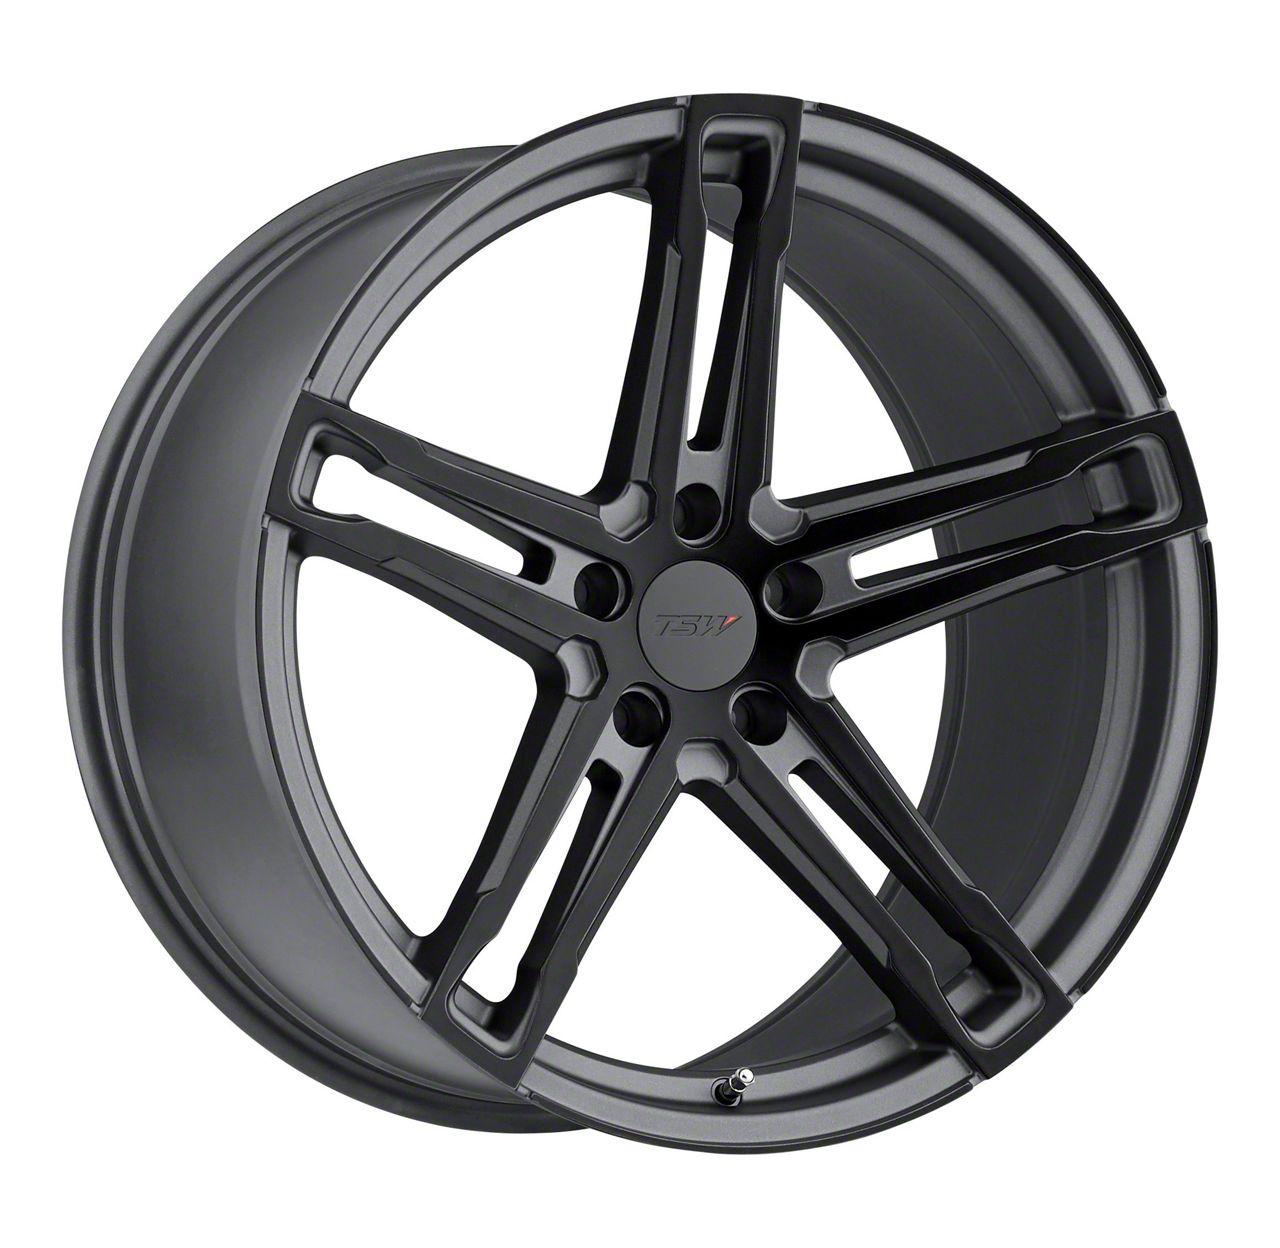 TSW Mechanica Matte Gunmetal w/ Matte Black Face Wheel - 20x11 (15-19 GT, EcoBoost, V6)